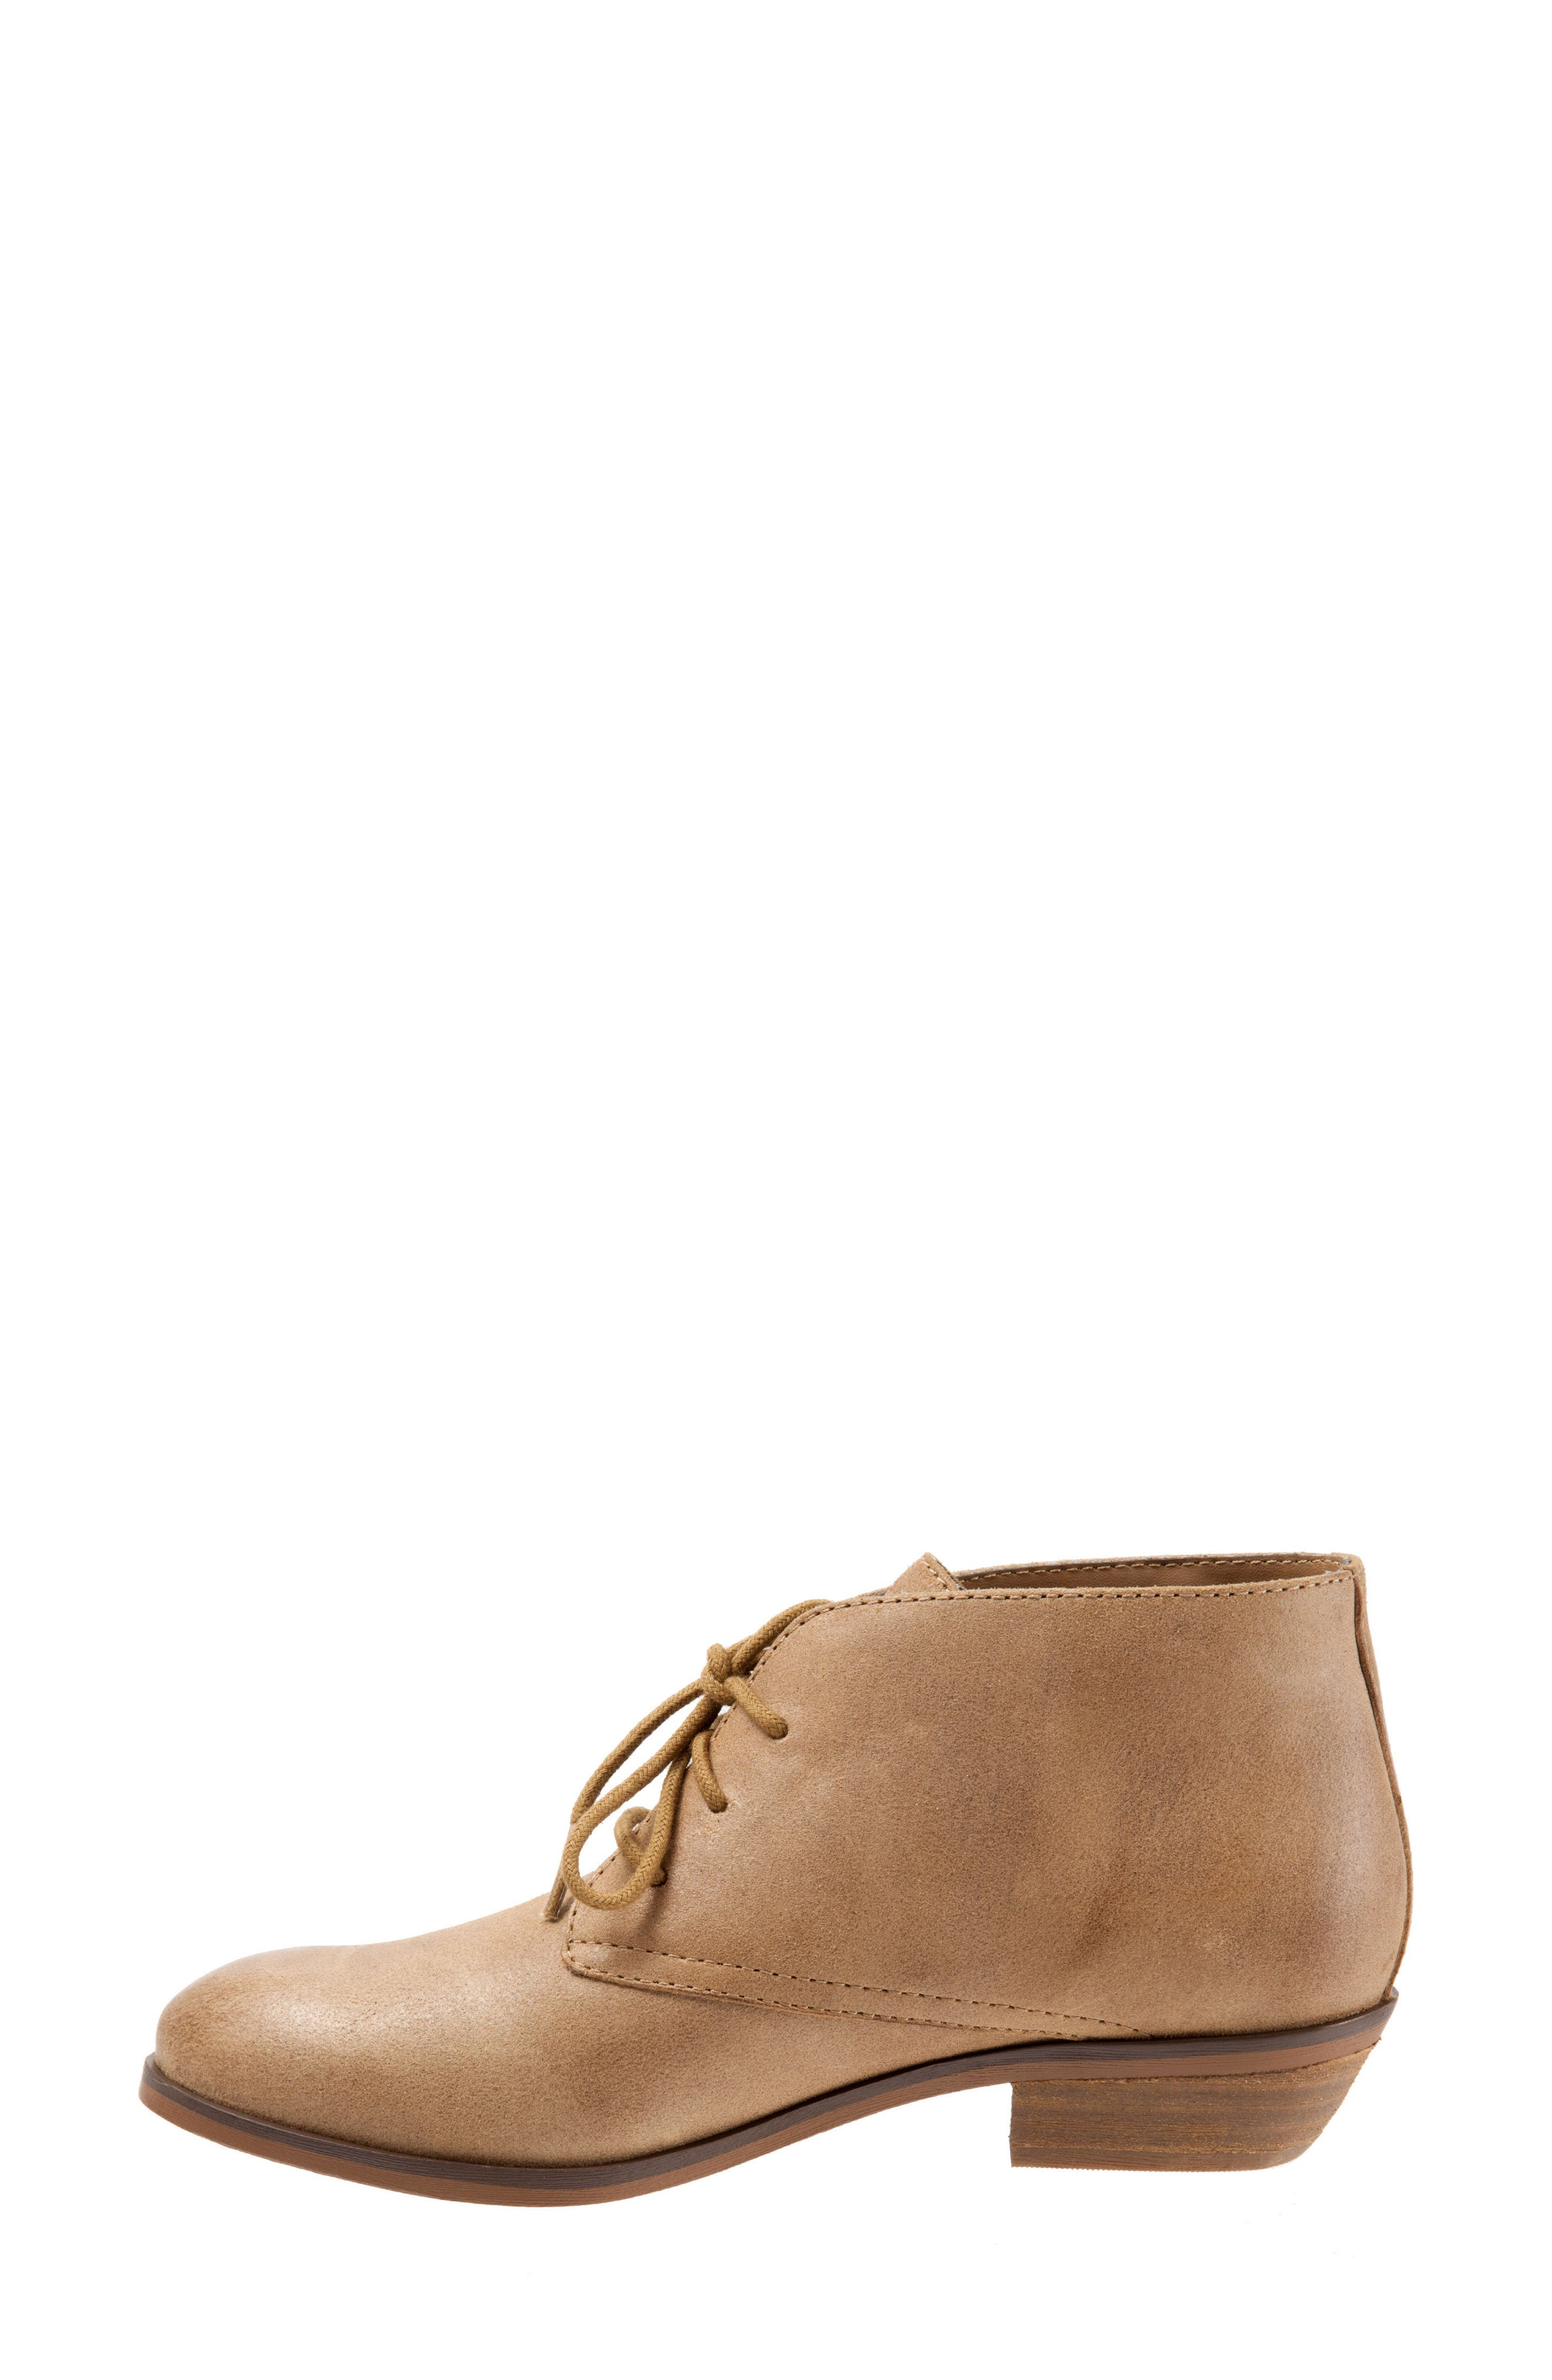 'Ramsey' Chukka Boot,                             Alternate thumbnail 2, color,                             Sand Leather